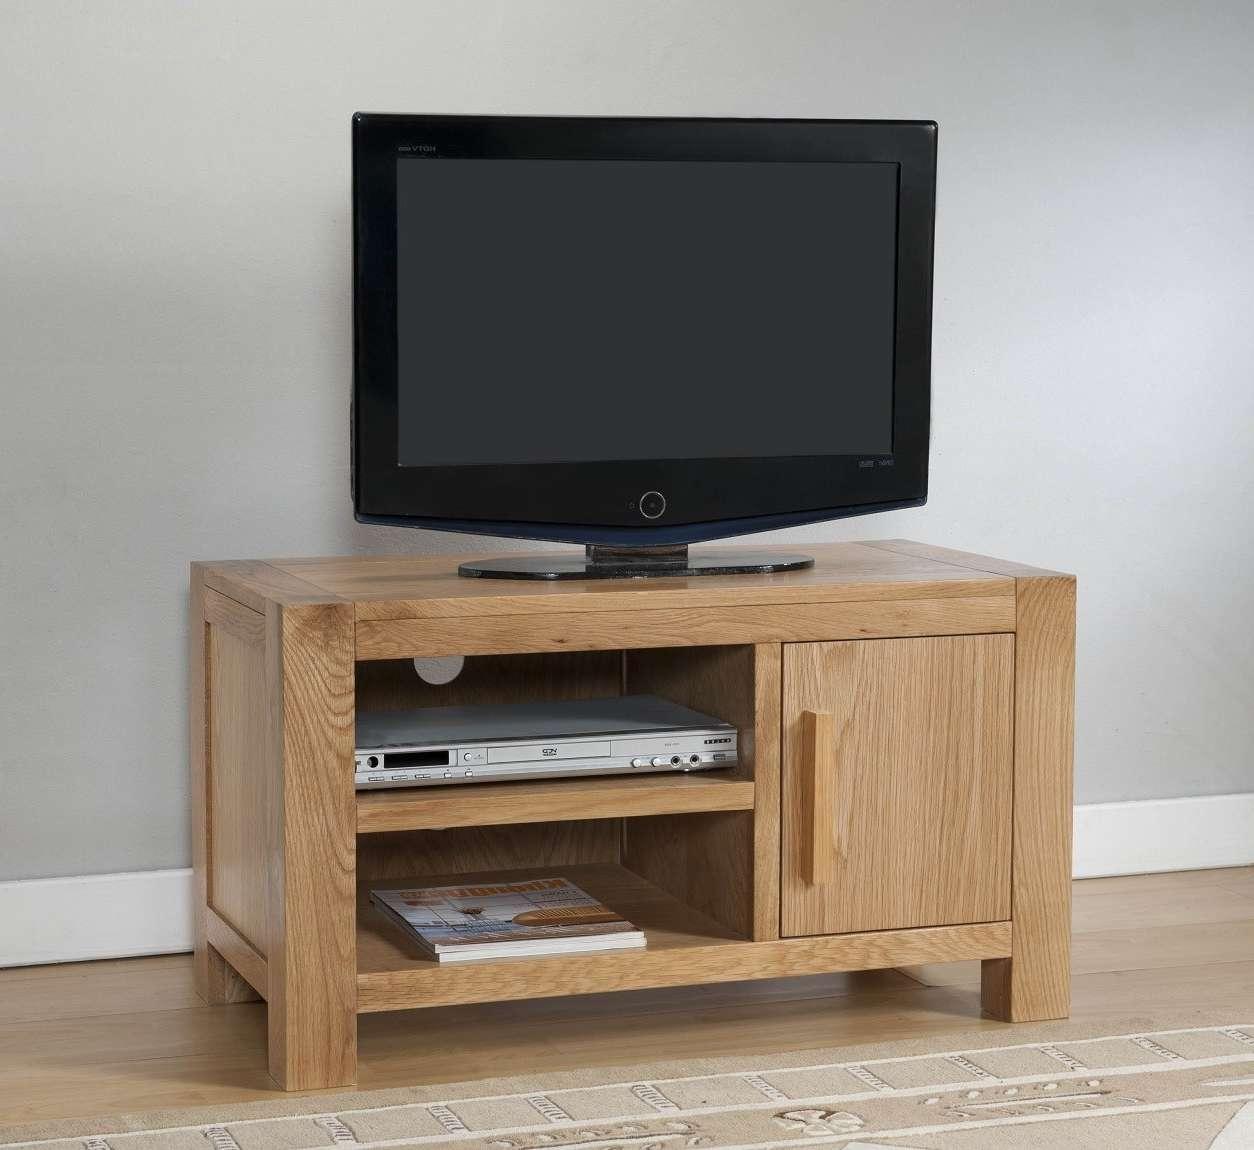 Aylesbury Contemporary Light Oak Small Tv Unit | Oak Furniture Uk Inside Contemporary Oak Tv Cabinets (View 5 of 20)